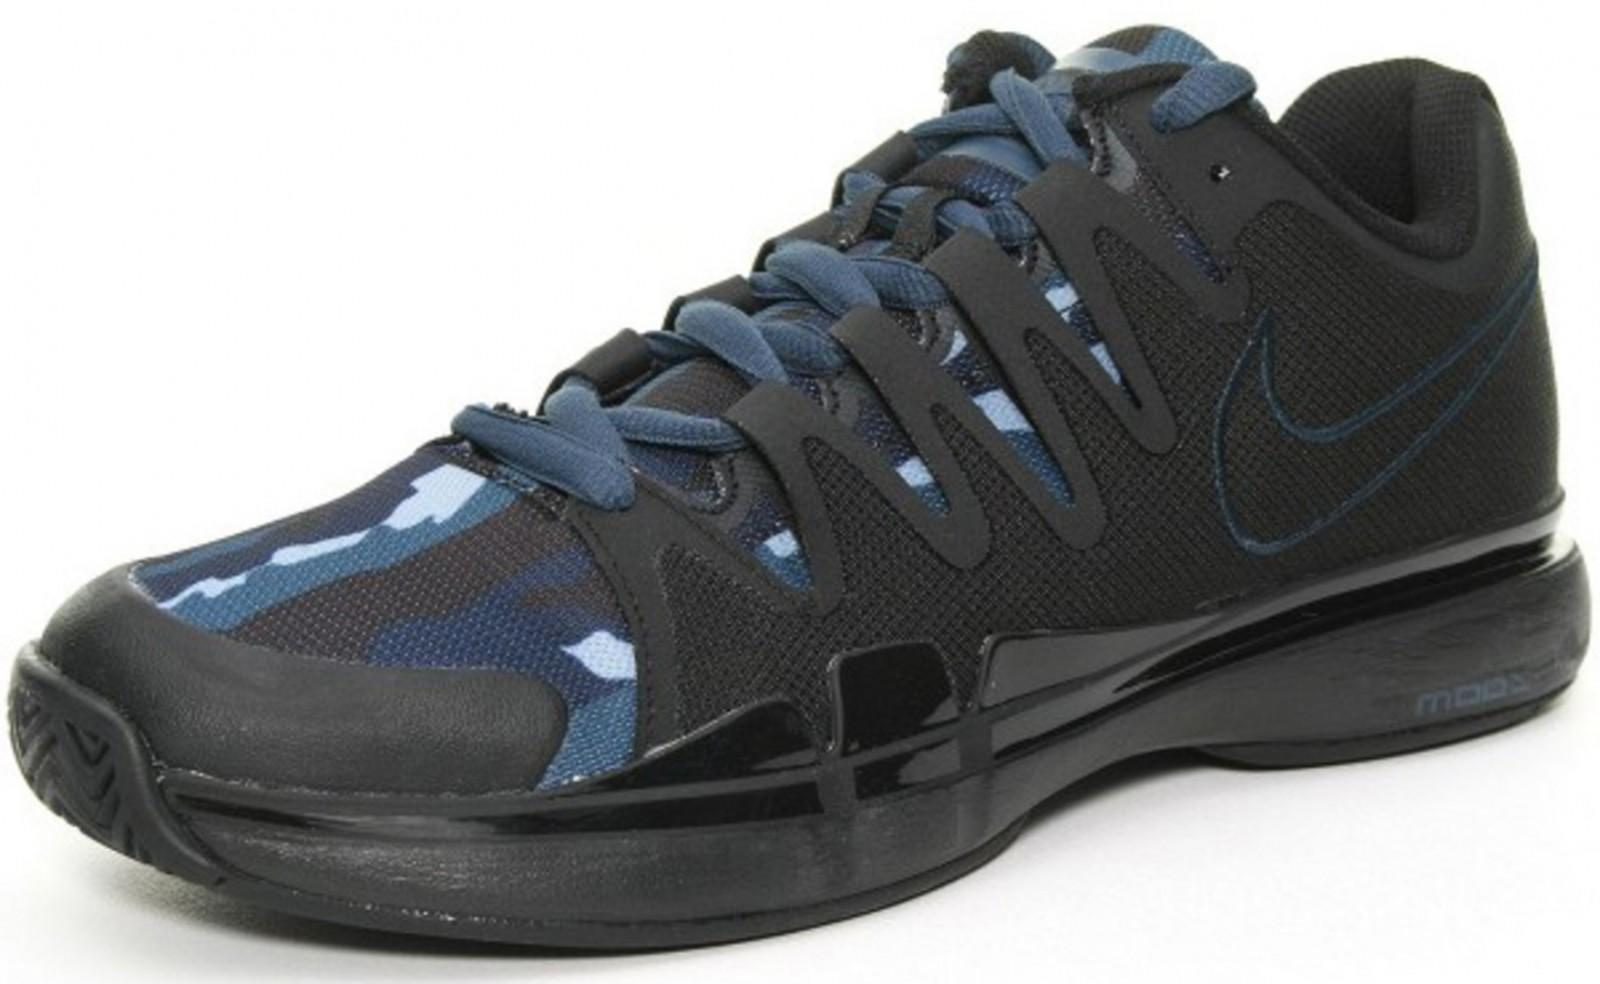 f074a2609c47 Детские теннисные кроссовки Nike Zoom Vapor 9.5 Tour Quickstrike All Court  Shoe Kids Blue Anthracite